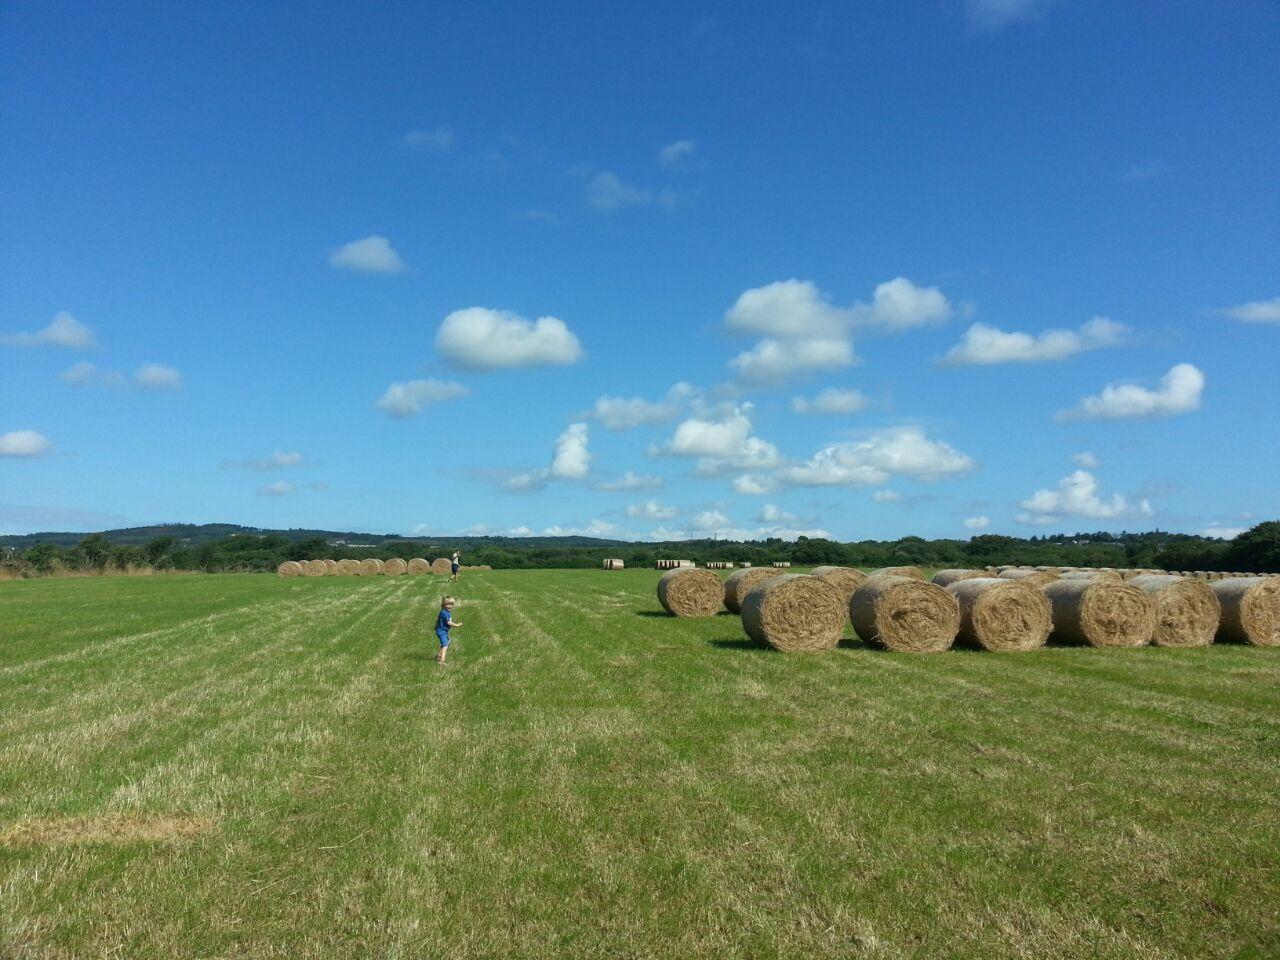 80 Acres Grassland - Gaynestown Stud Wexford